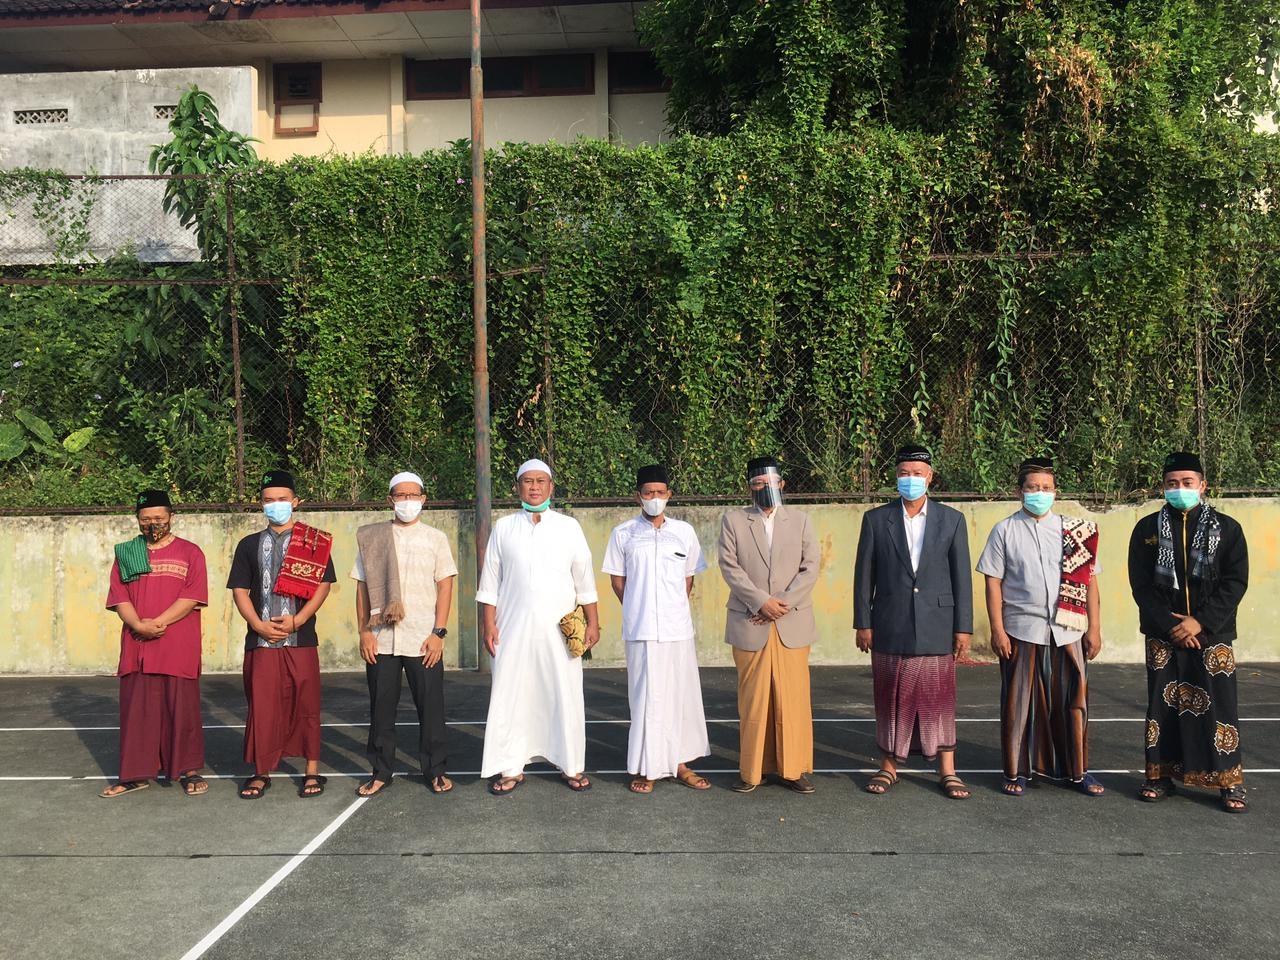 Wakil Walikota Yogyakarta Drs. Heroe Poerwadi, MA menjadi Khatib Sholat Idul Fitri di Lapangan Tenis Dr Gunawan RW 08 Sidobali Kelurahan Muja Muju Kemantren Umbulharjo